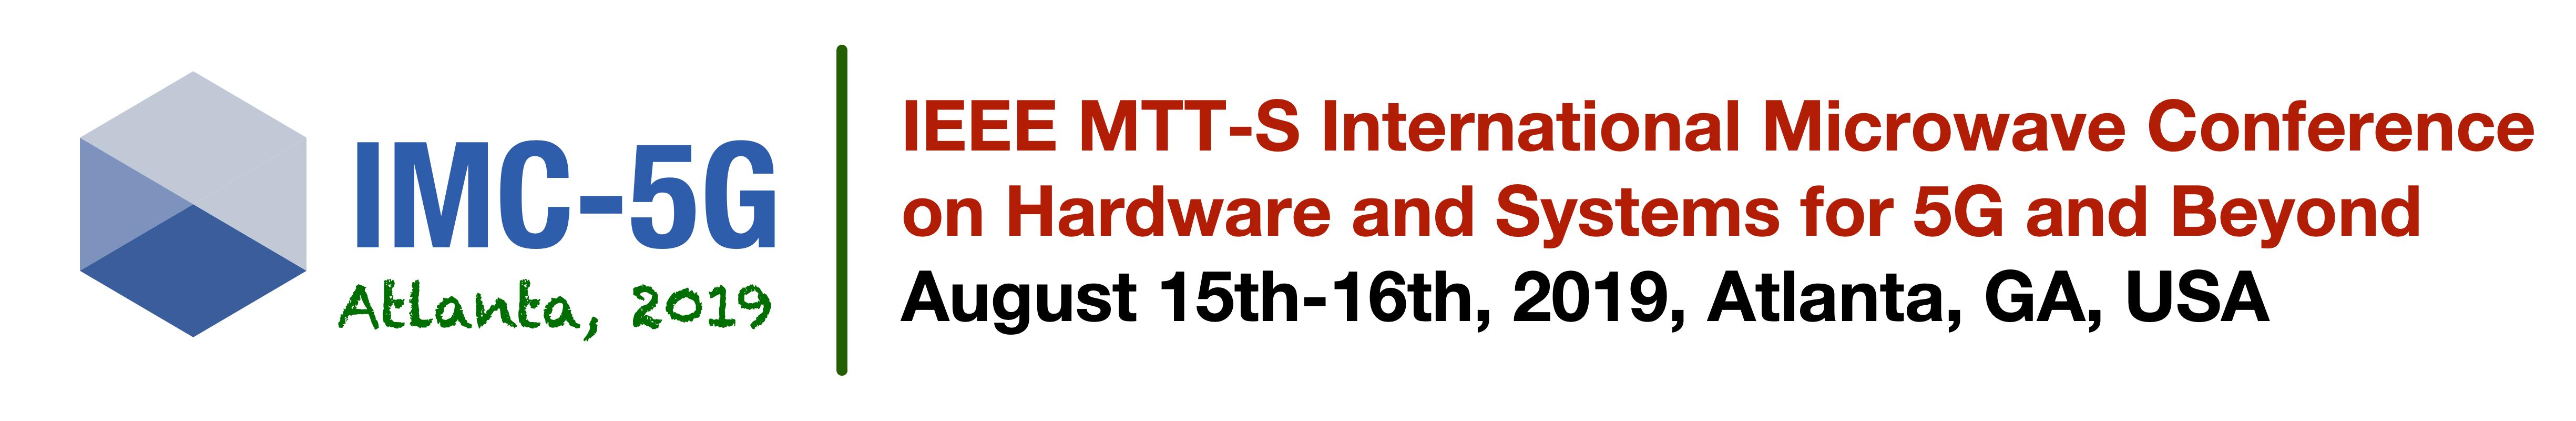 IMC-5G 2019 | IEEE MTT-S International Microwave Conference on